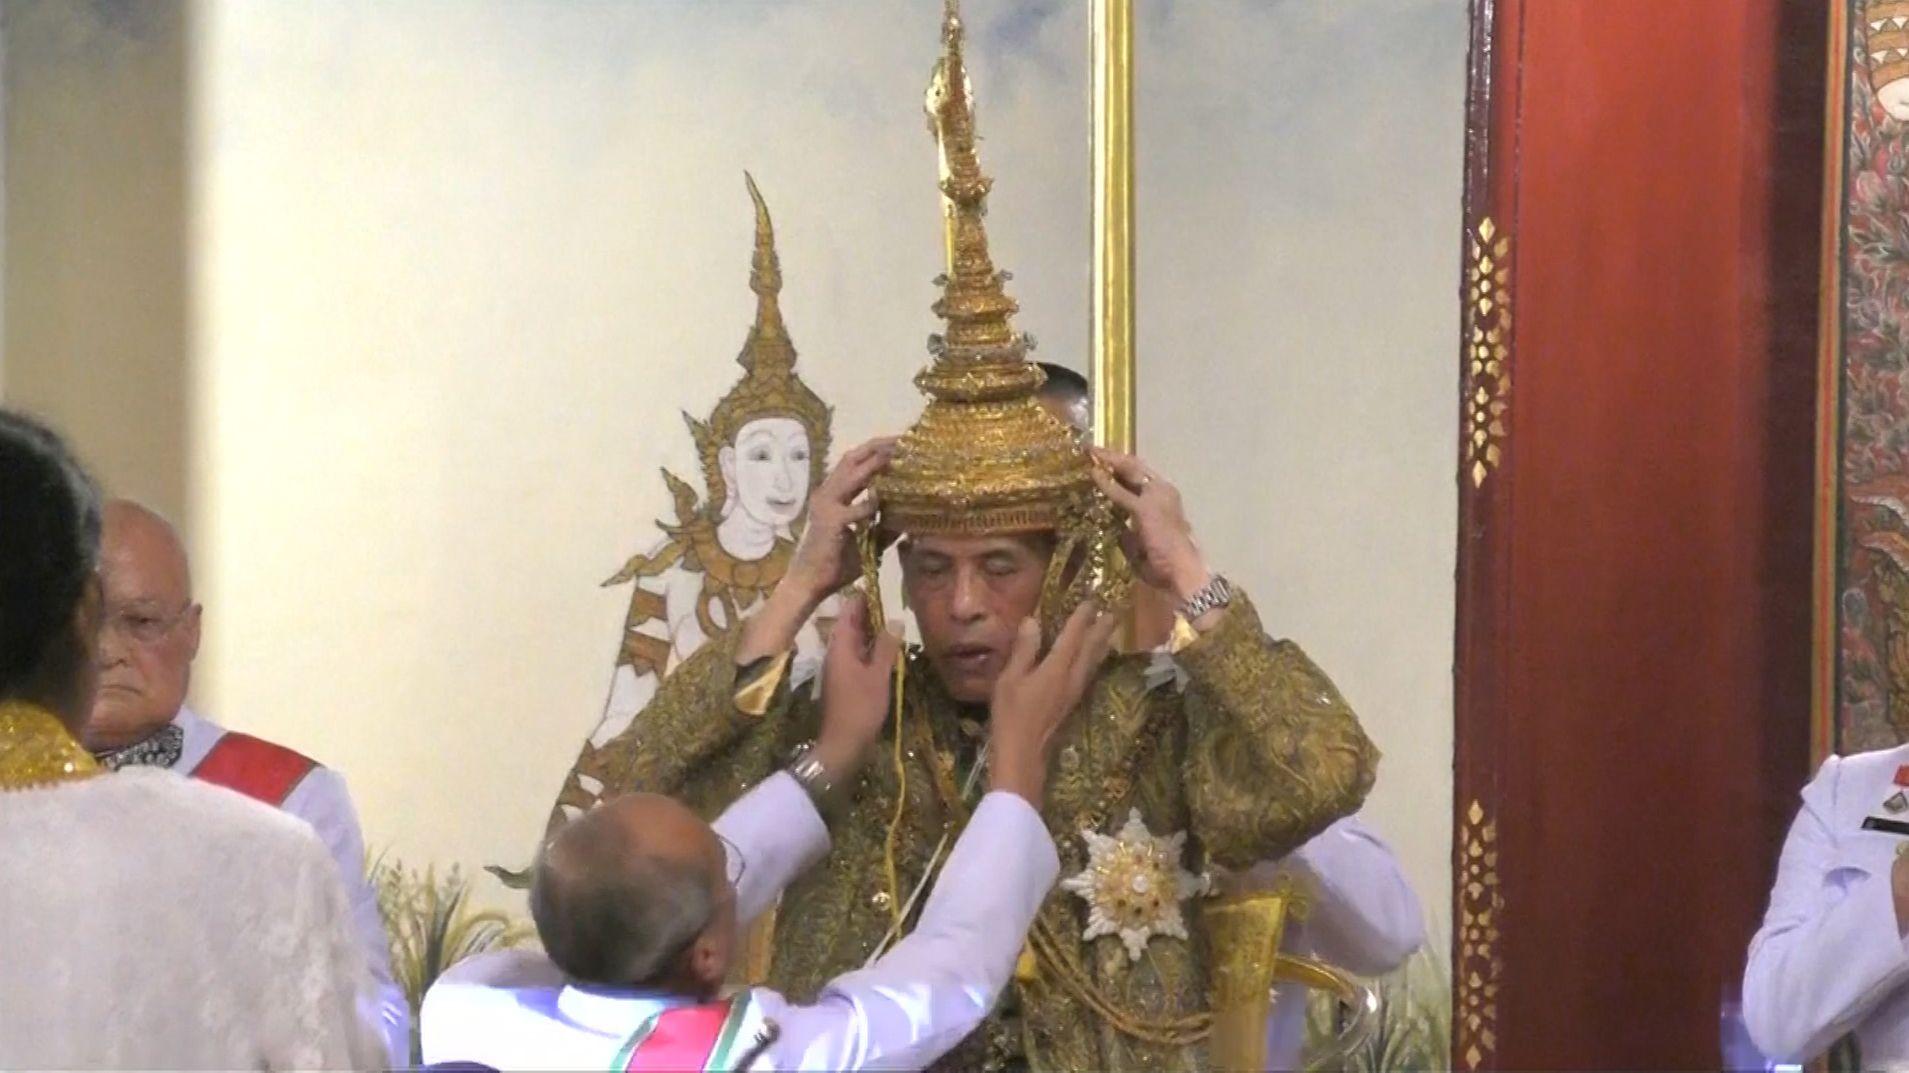 König Rama X. mit Krone